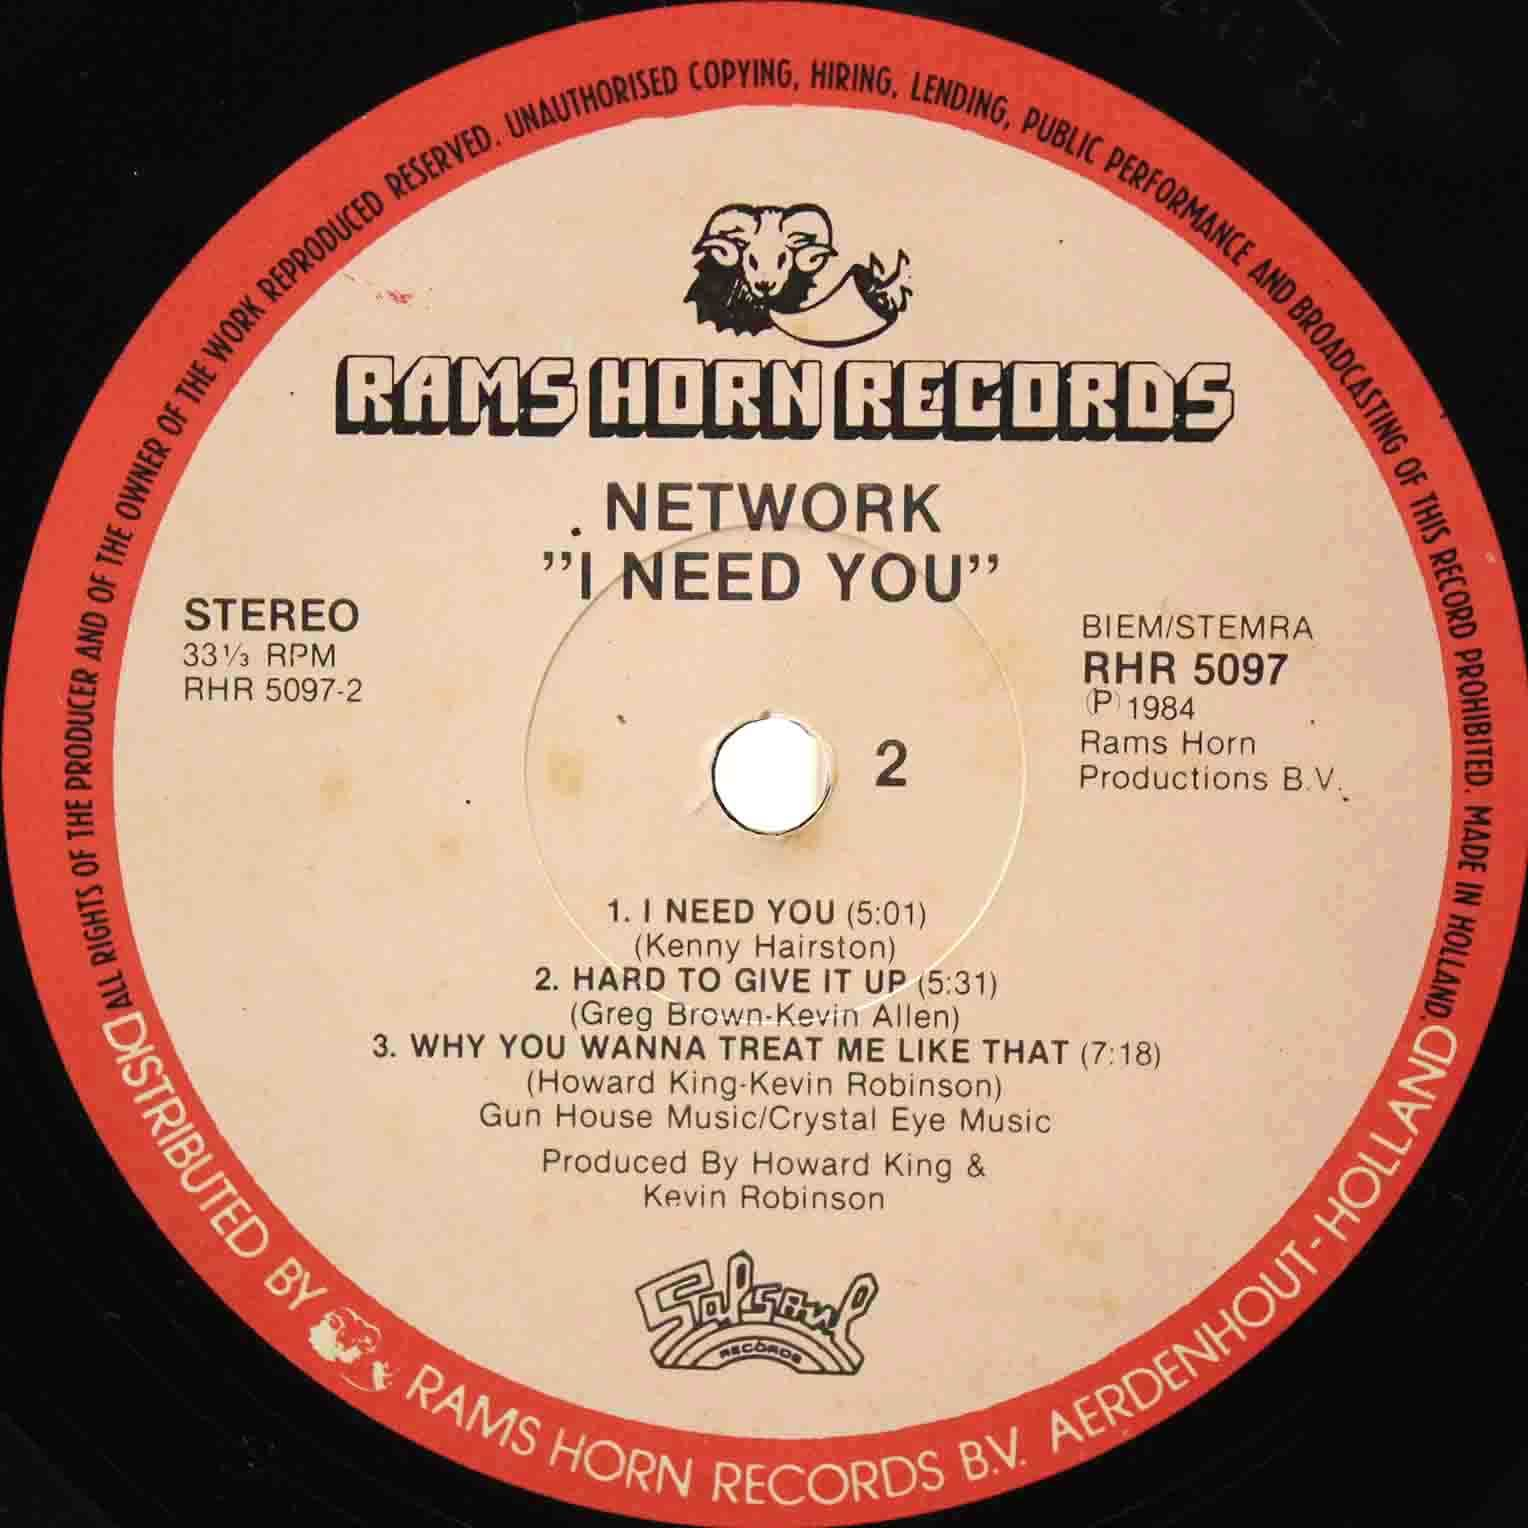 Network I Need You 04